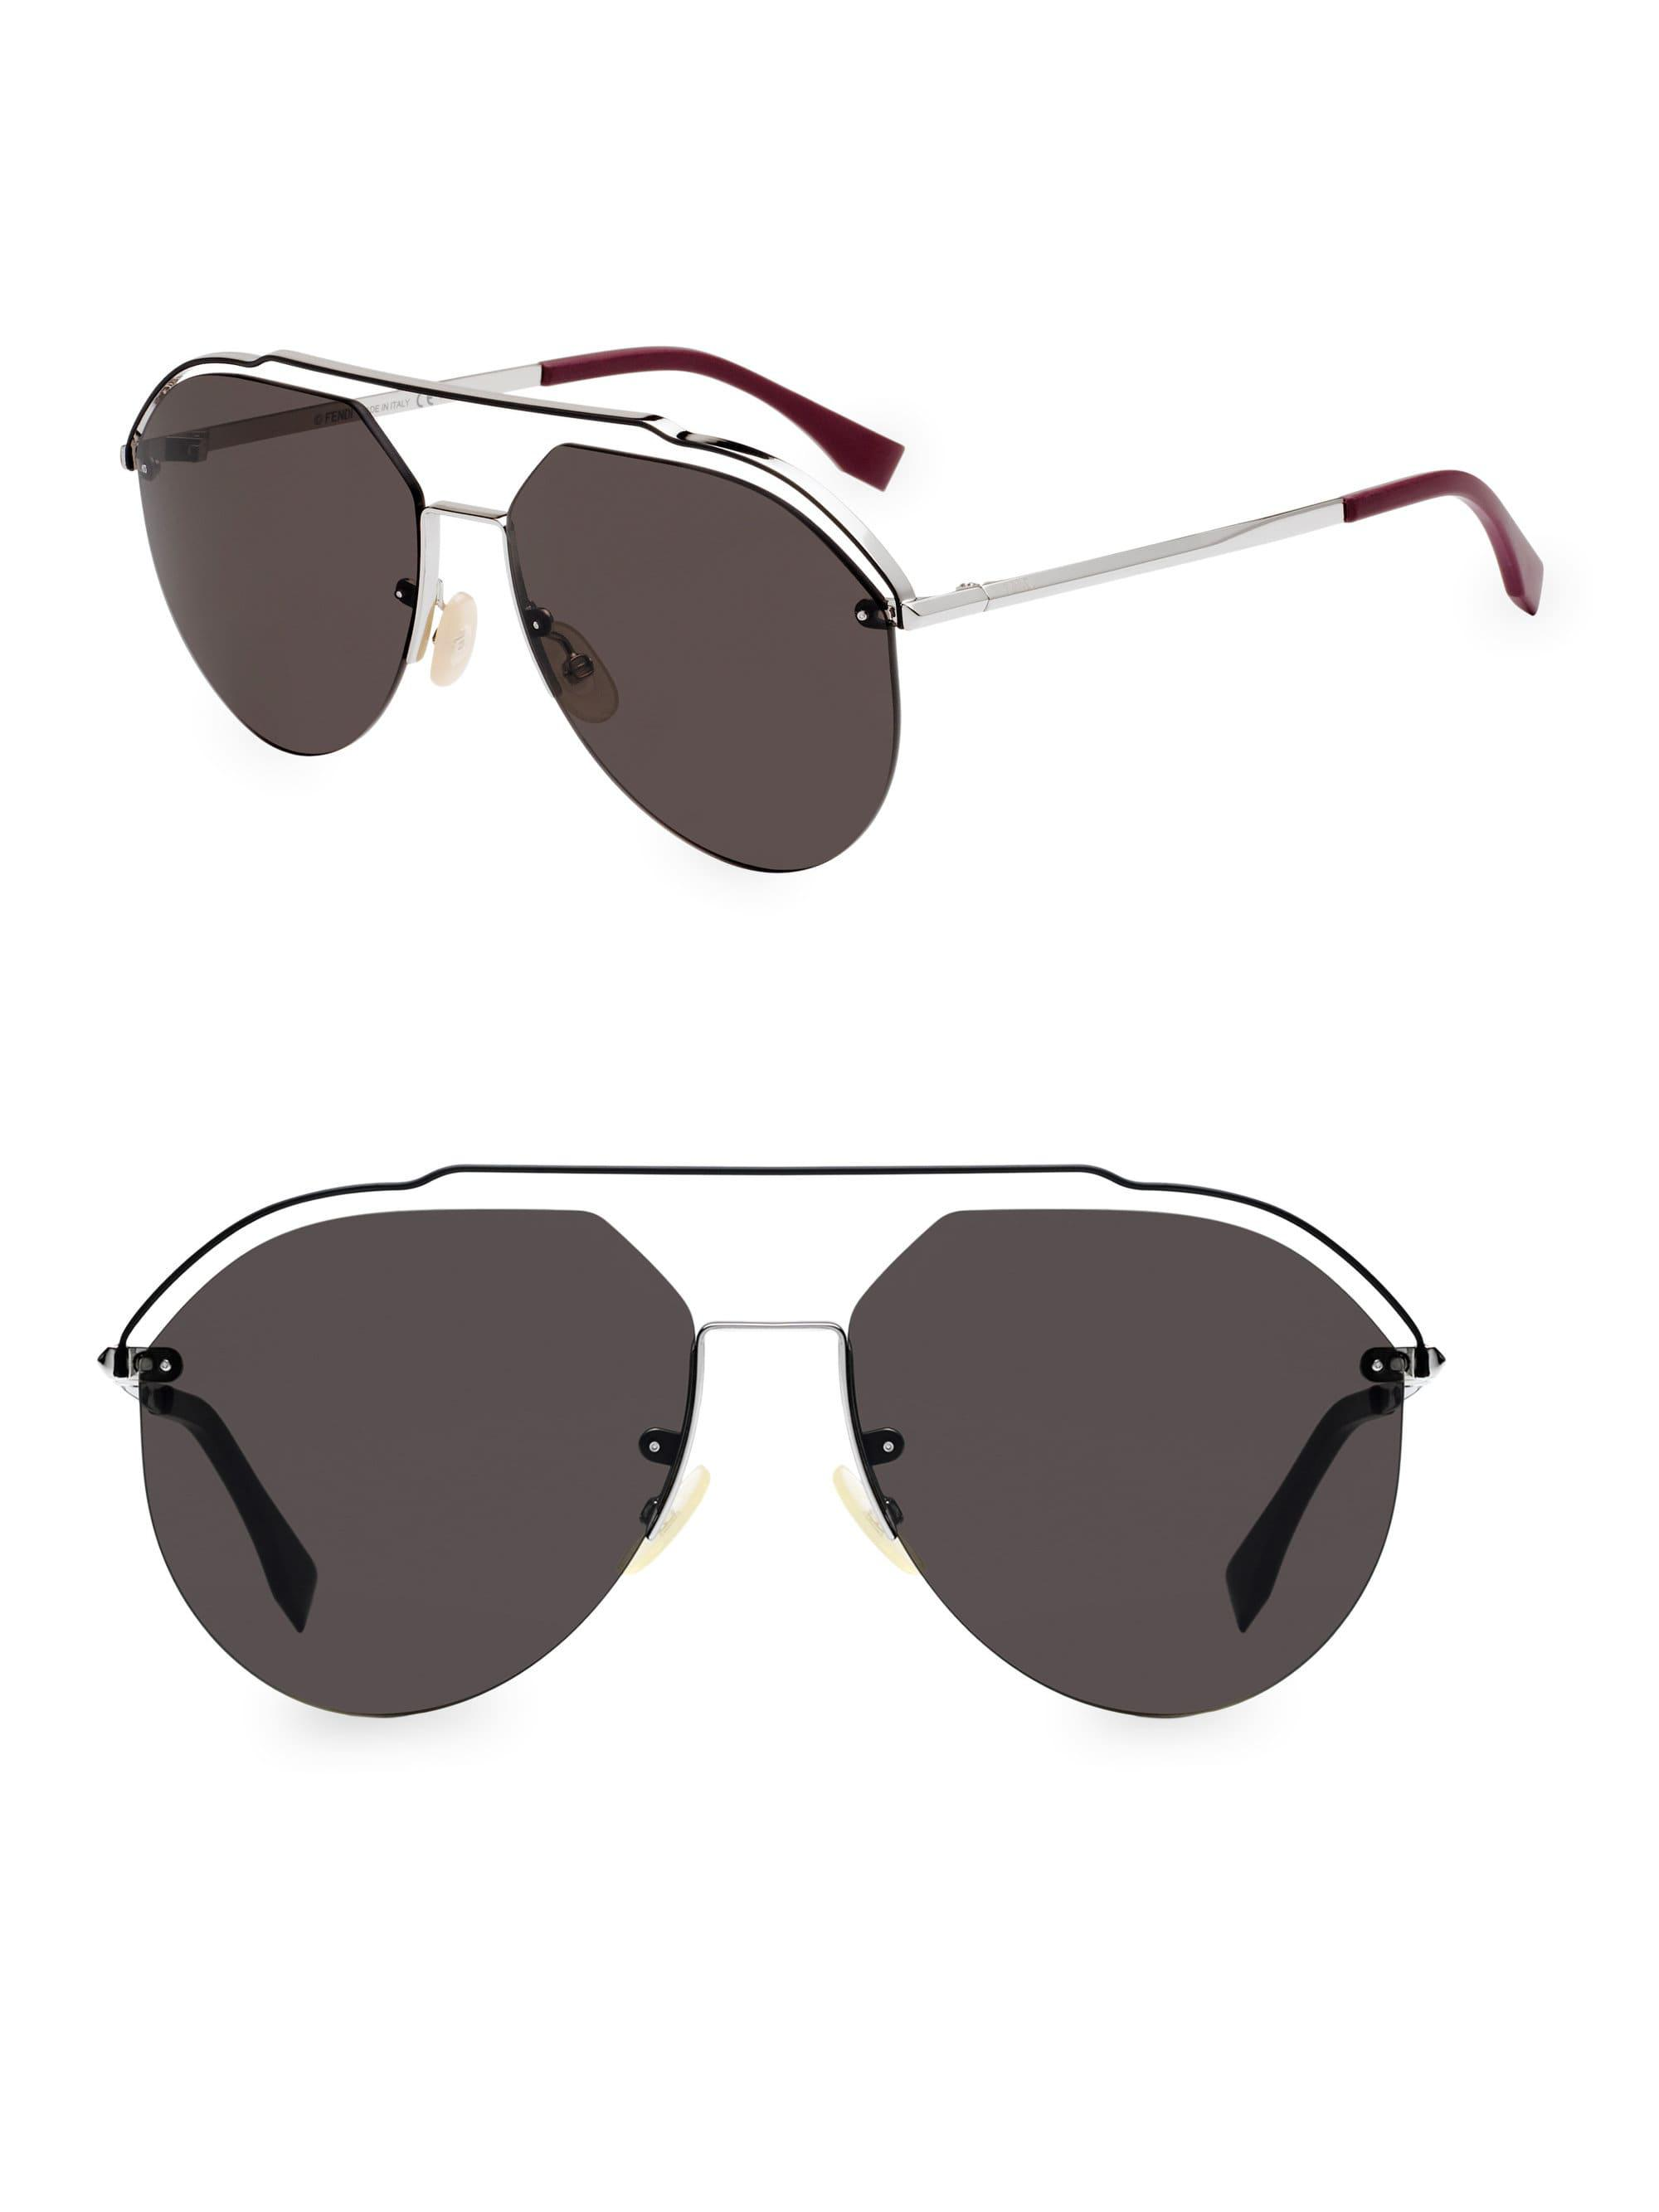 0603a9f2046 Fendi. Men s 61mm Metal Aviator Sunglasses. £394 From Saks Fifth Avenue ...